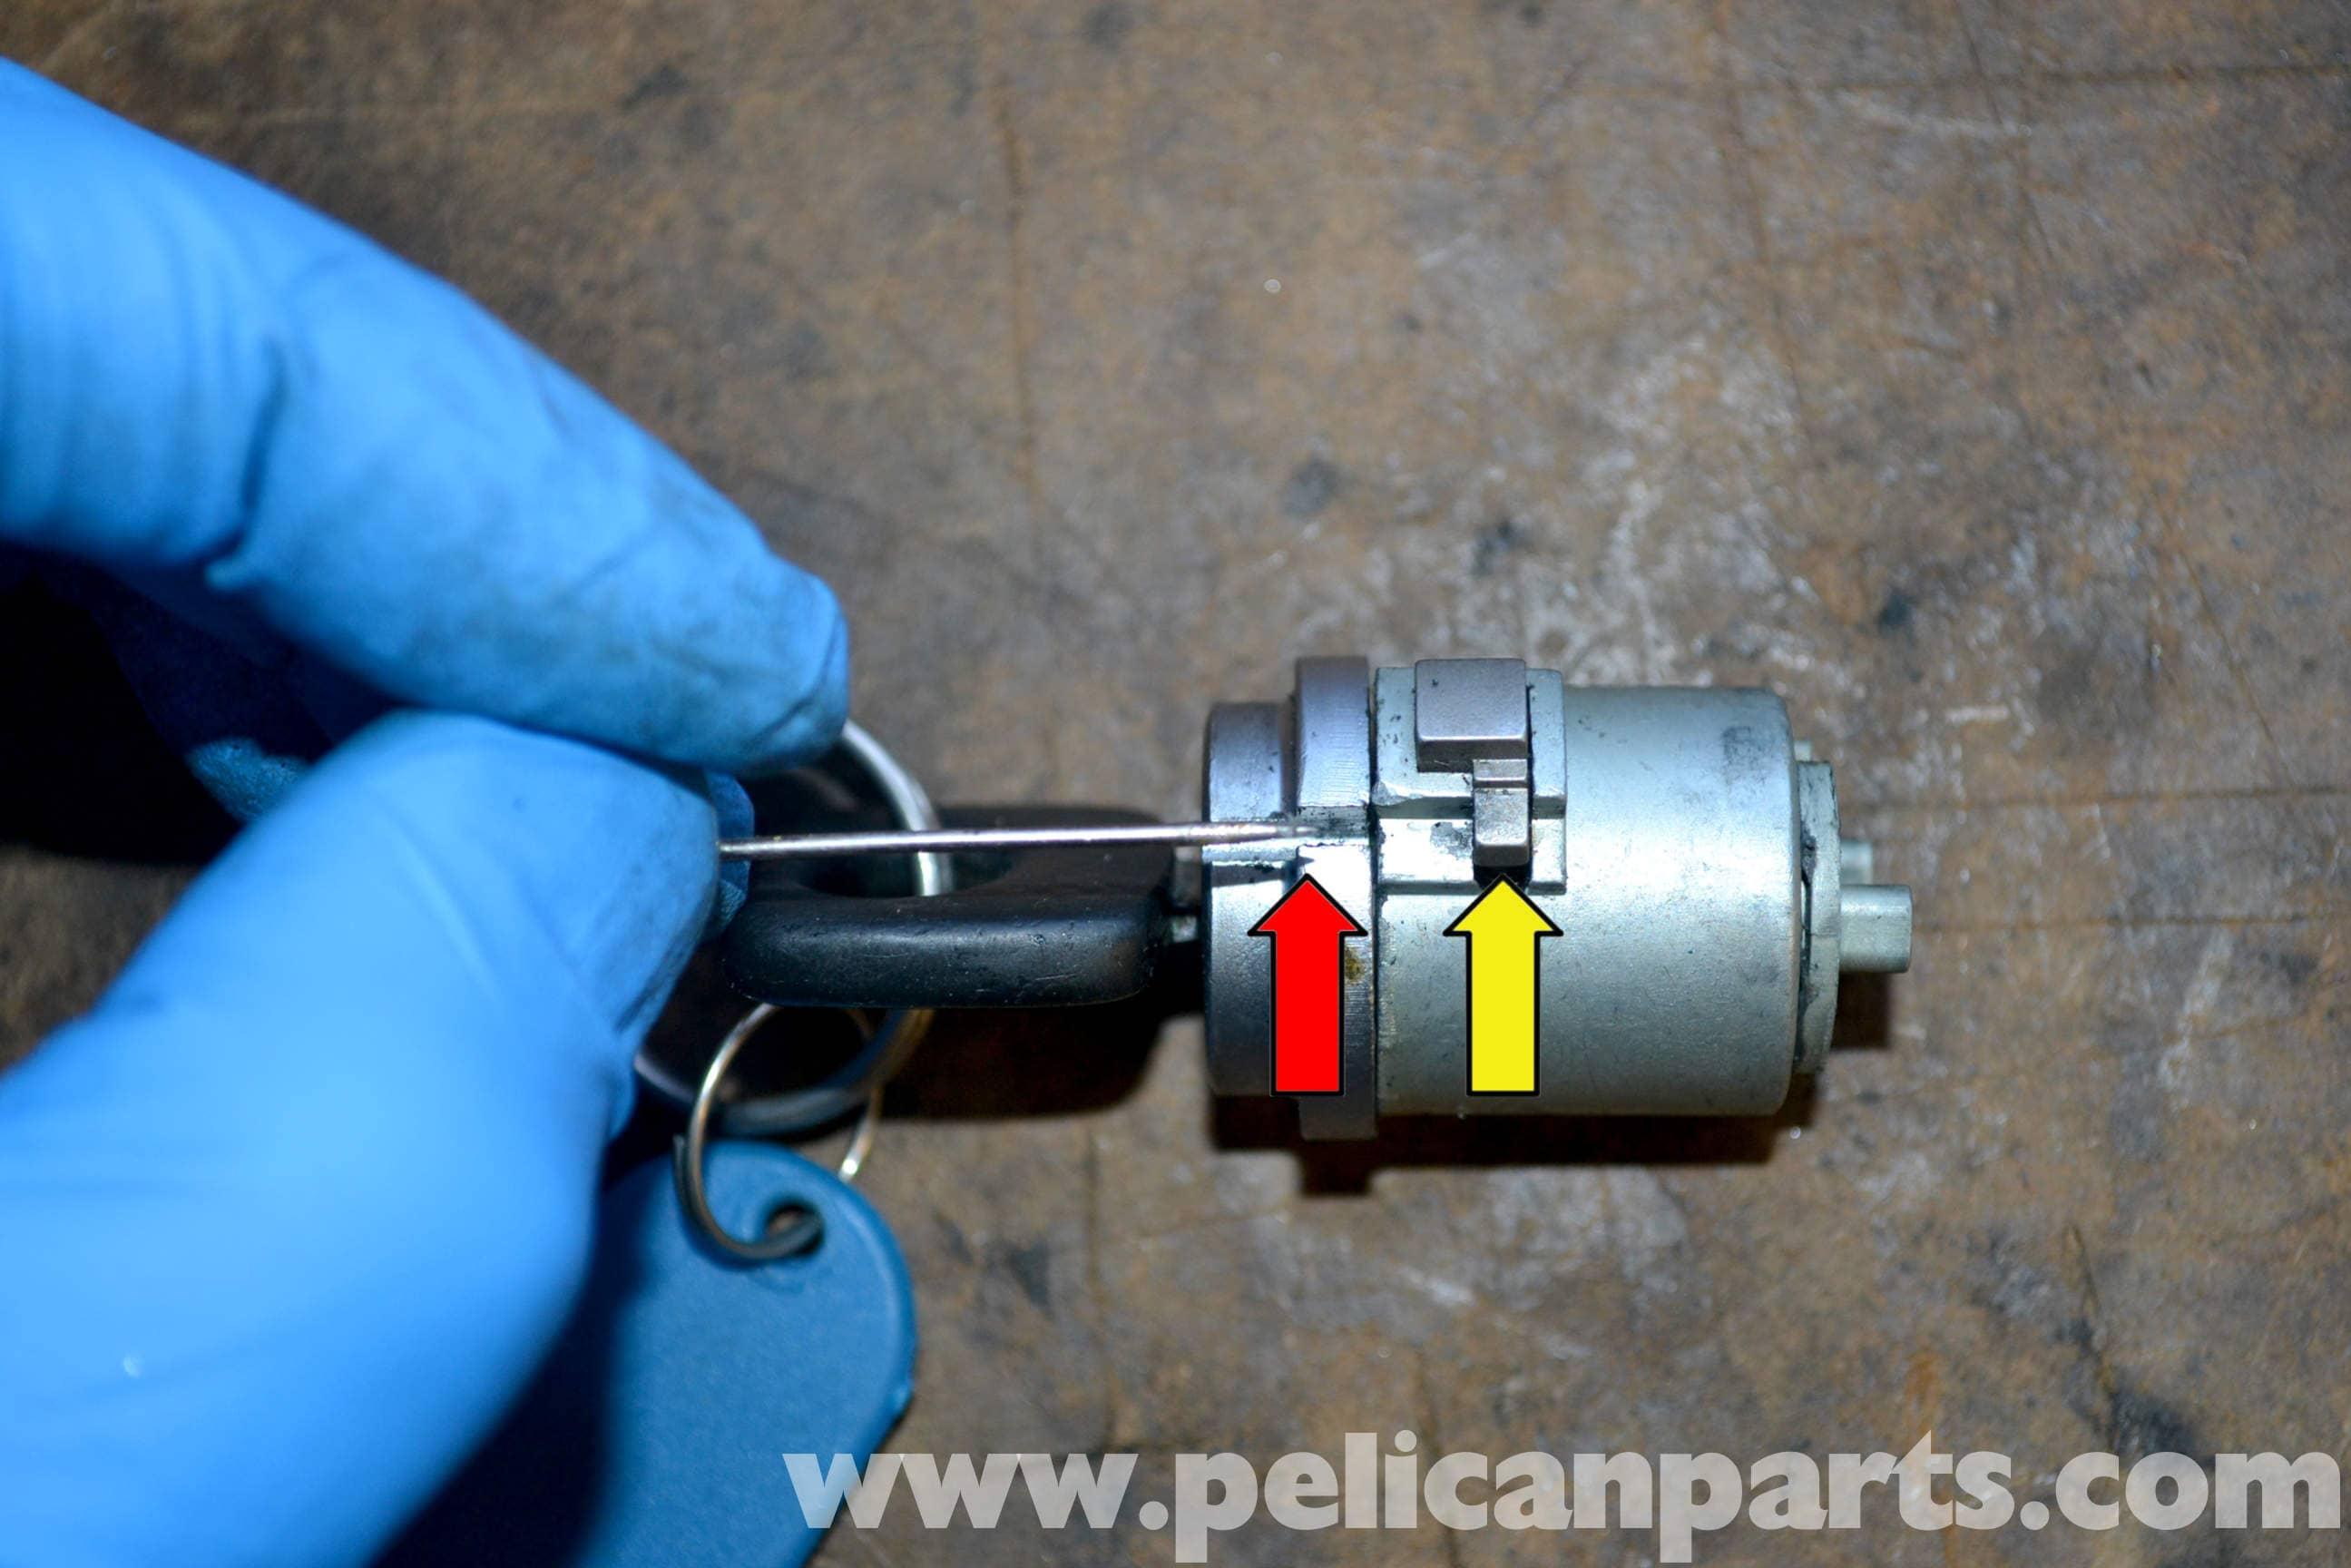 Mercedes Benz Parts Online >> Mercedes-Benz W123 Ignition Tumbler Removal | W123 (1977-1985) | Pelican Parts DIY Maintenance ...